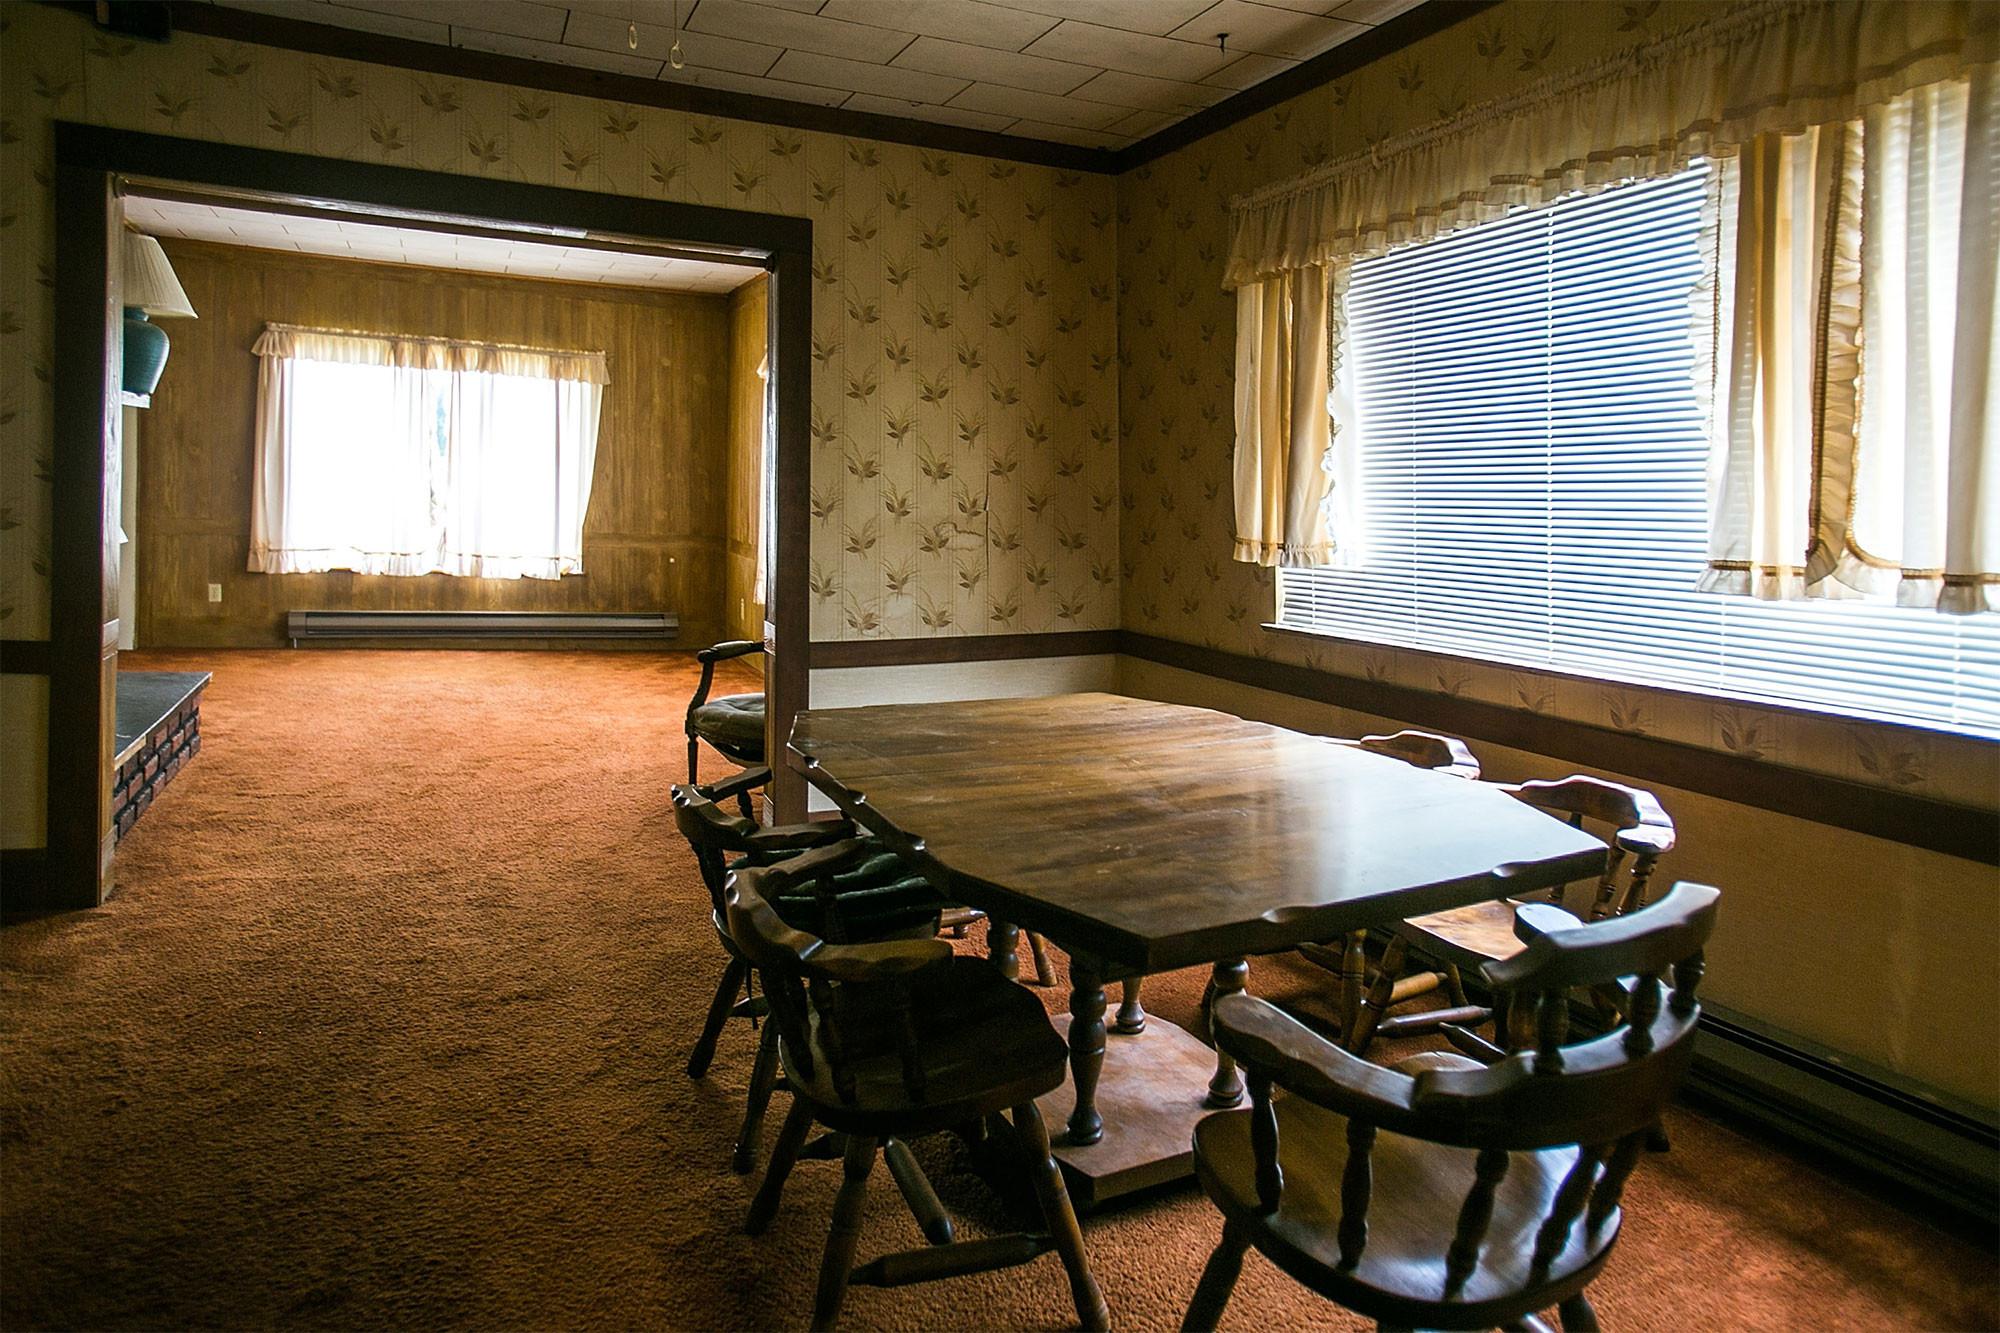 Kurt's Dining Room